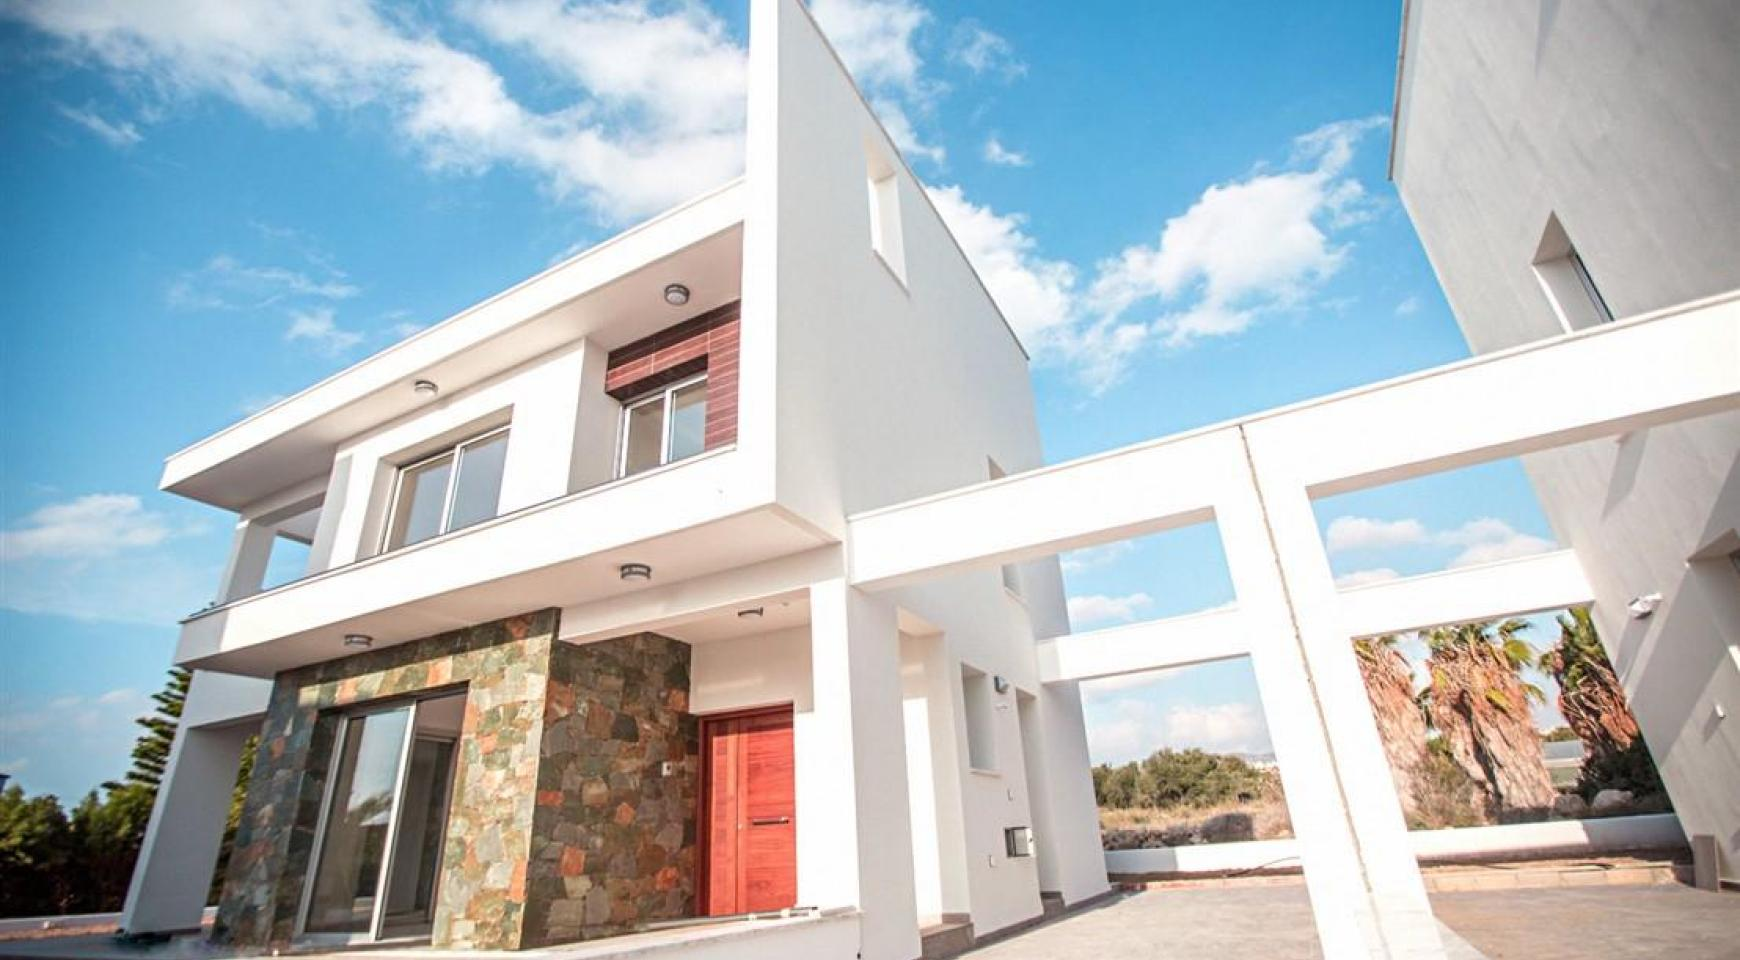 3 Bedroom Villa in Chloraka - 10